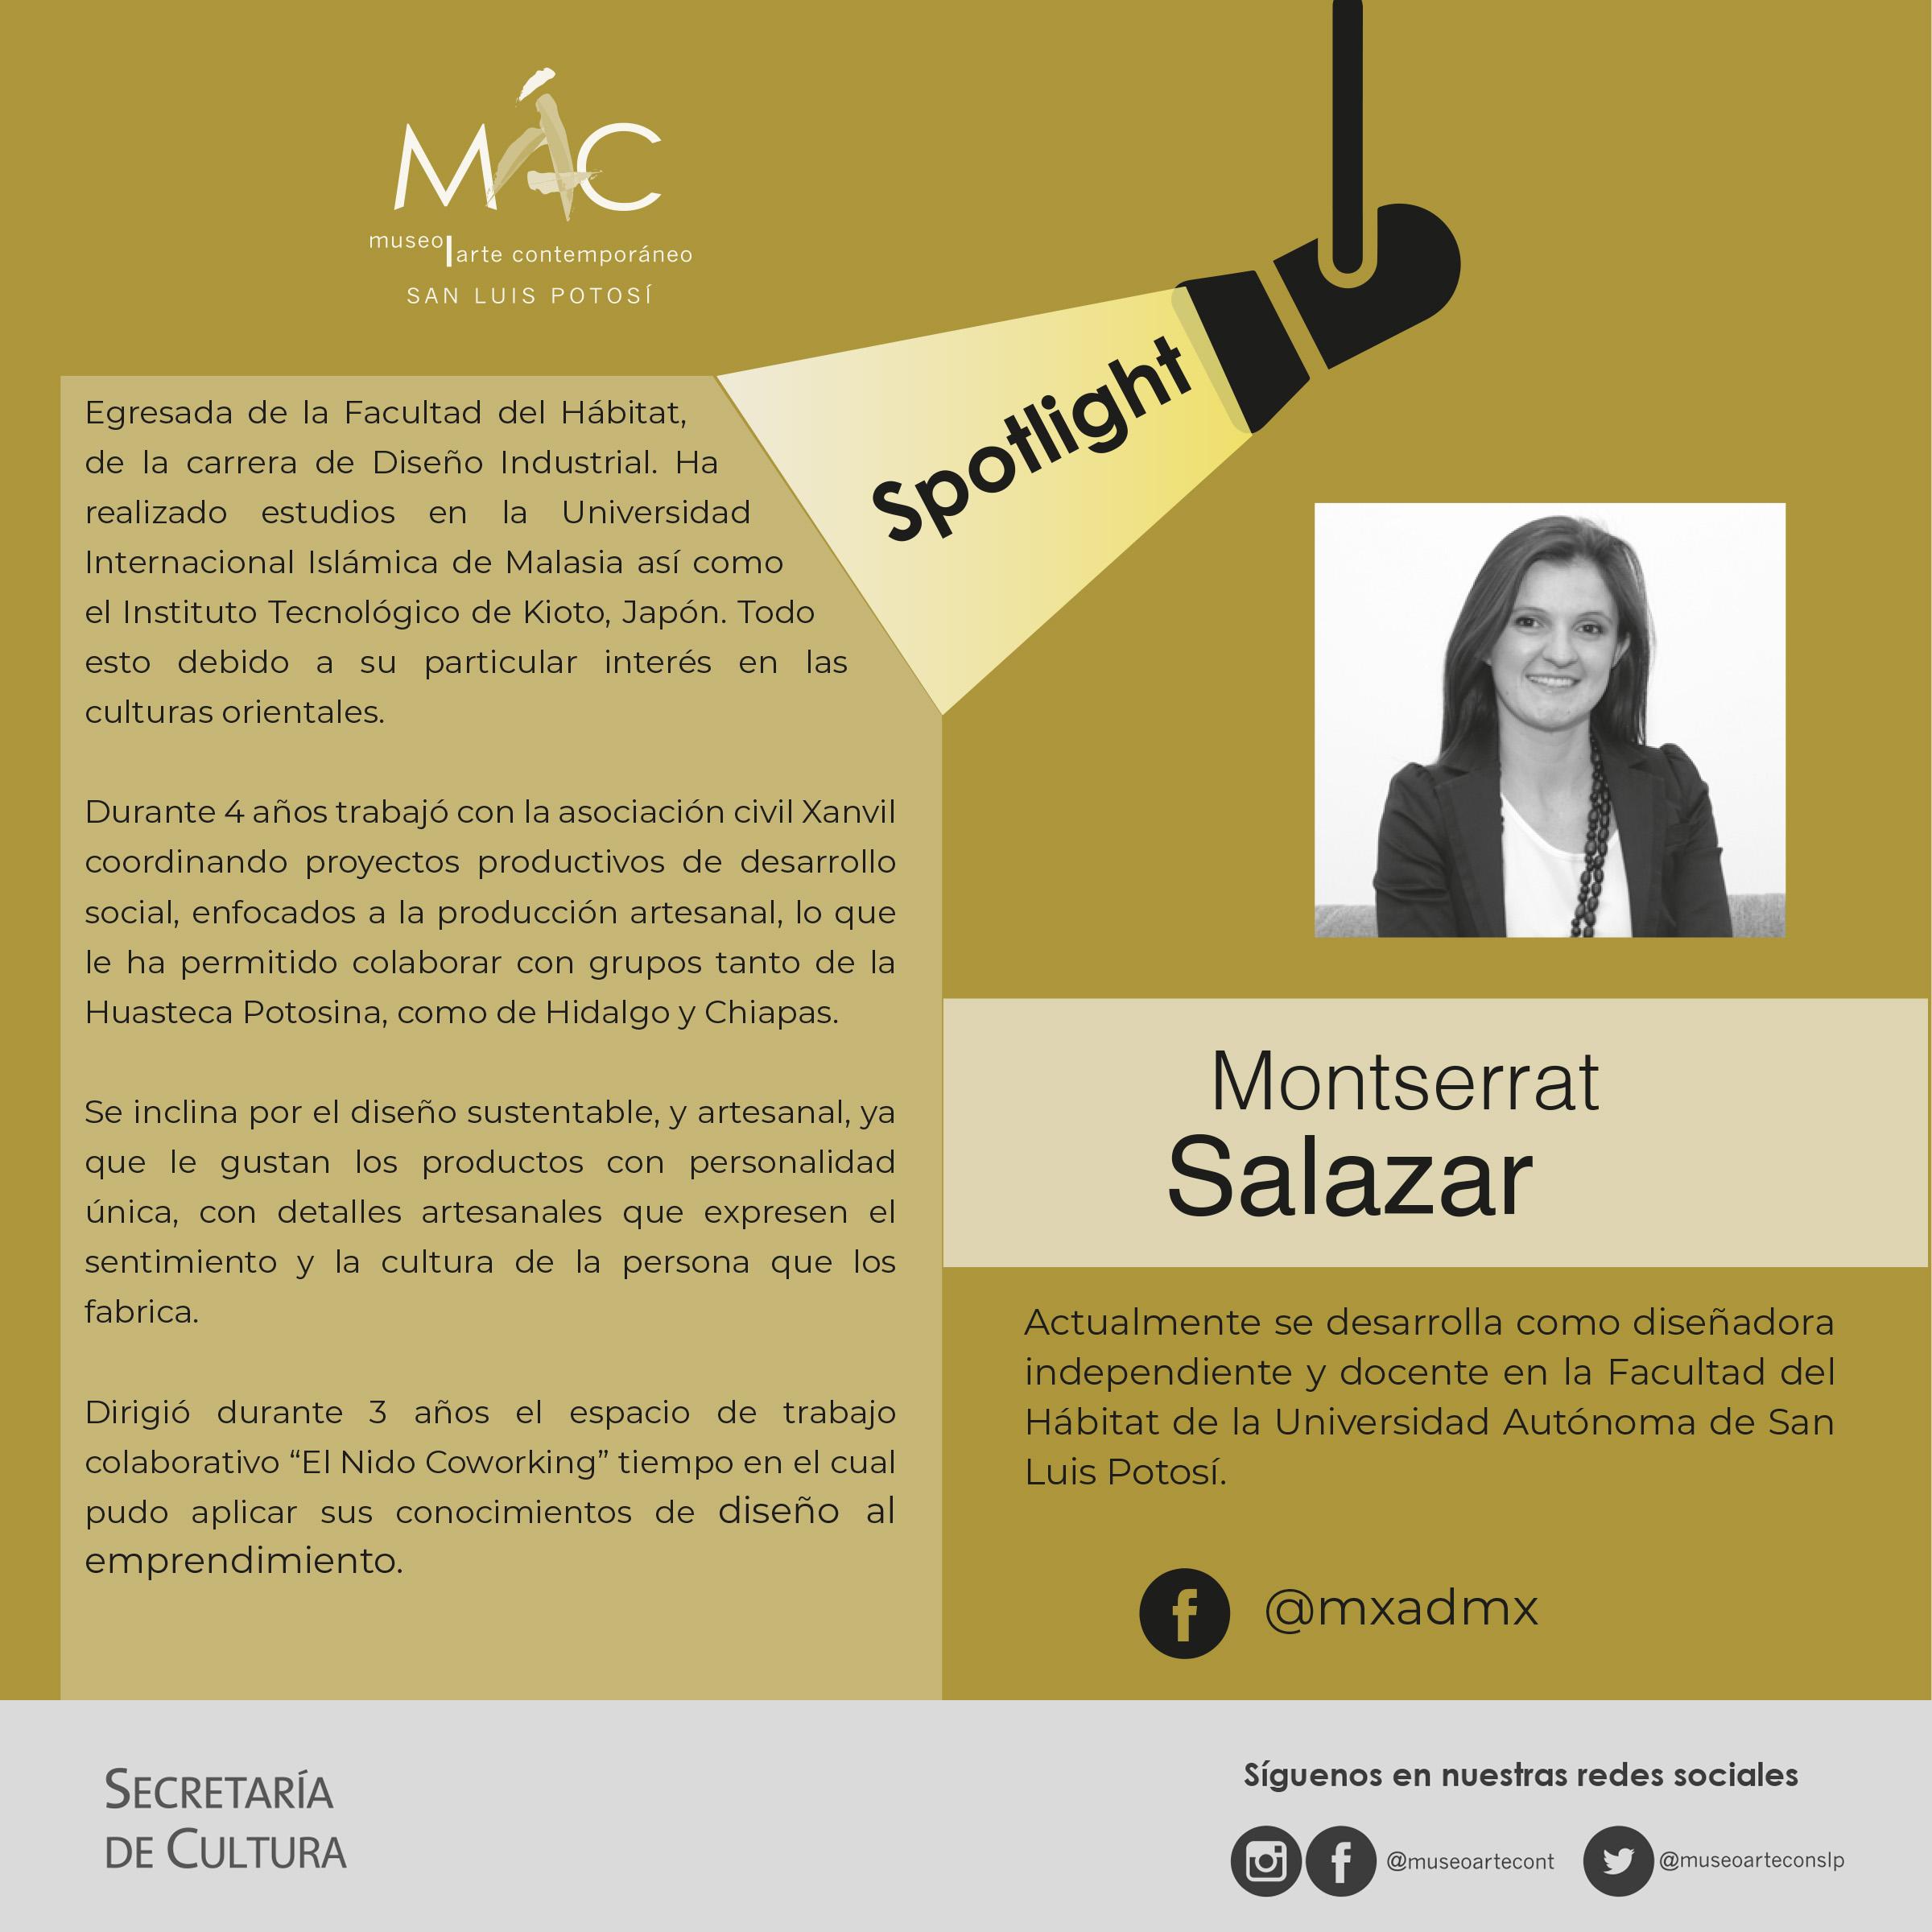 montserrat_salazar